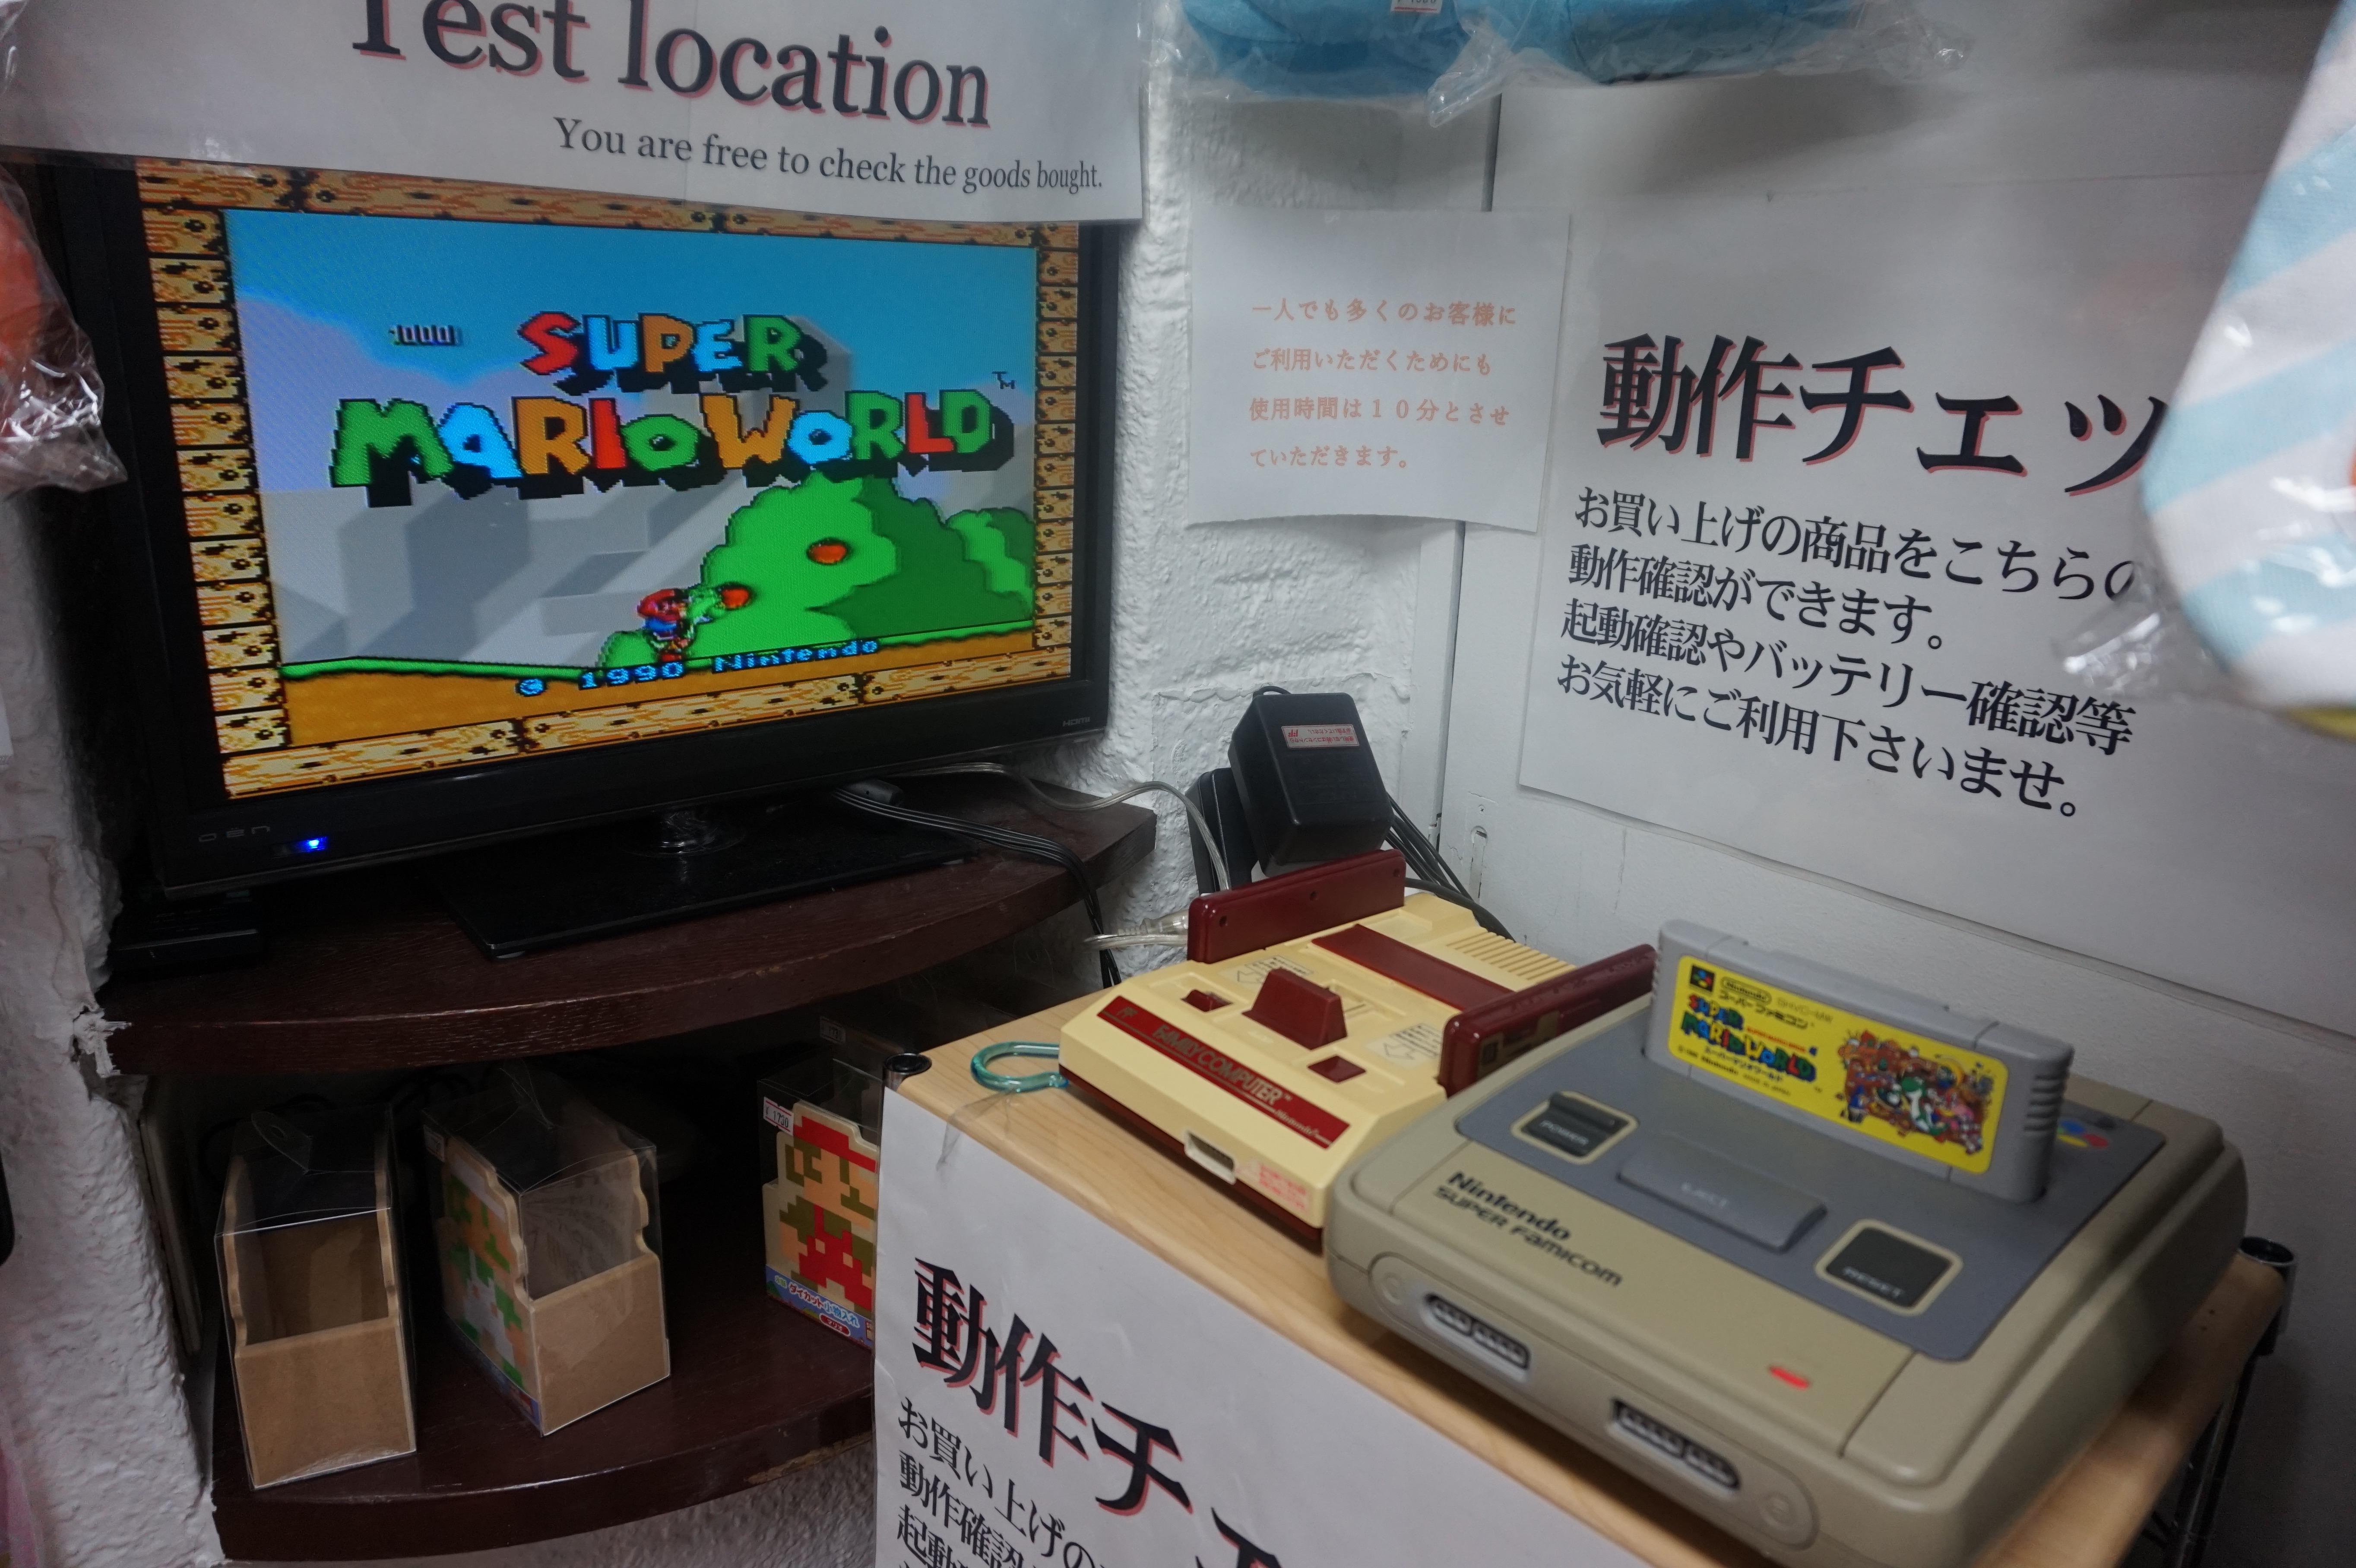 Retro Video Gaming in Akihabara, Tokyo